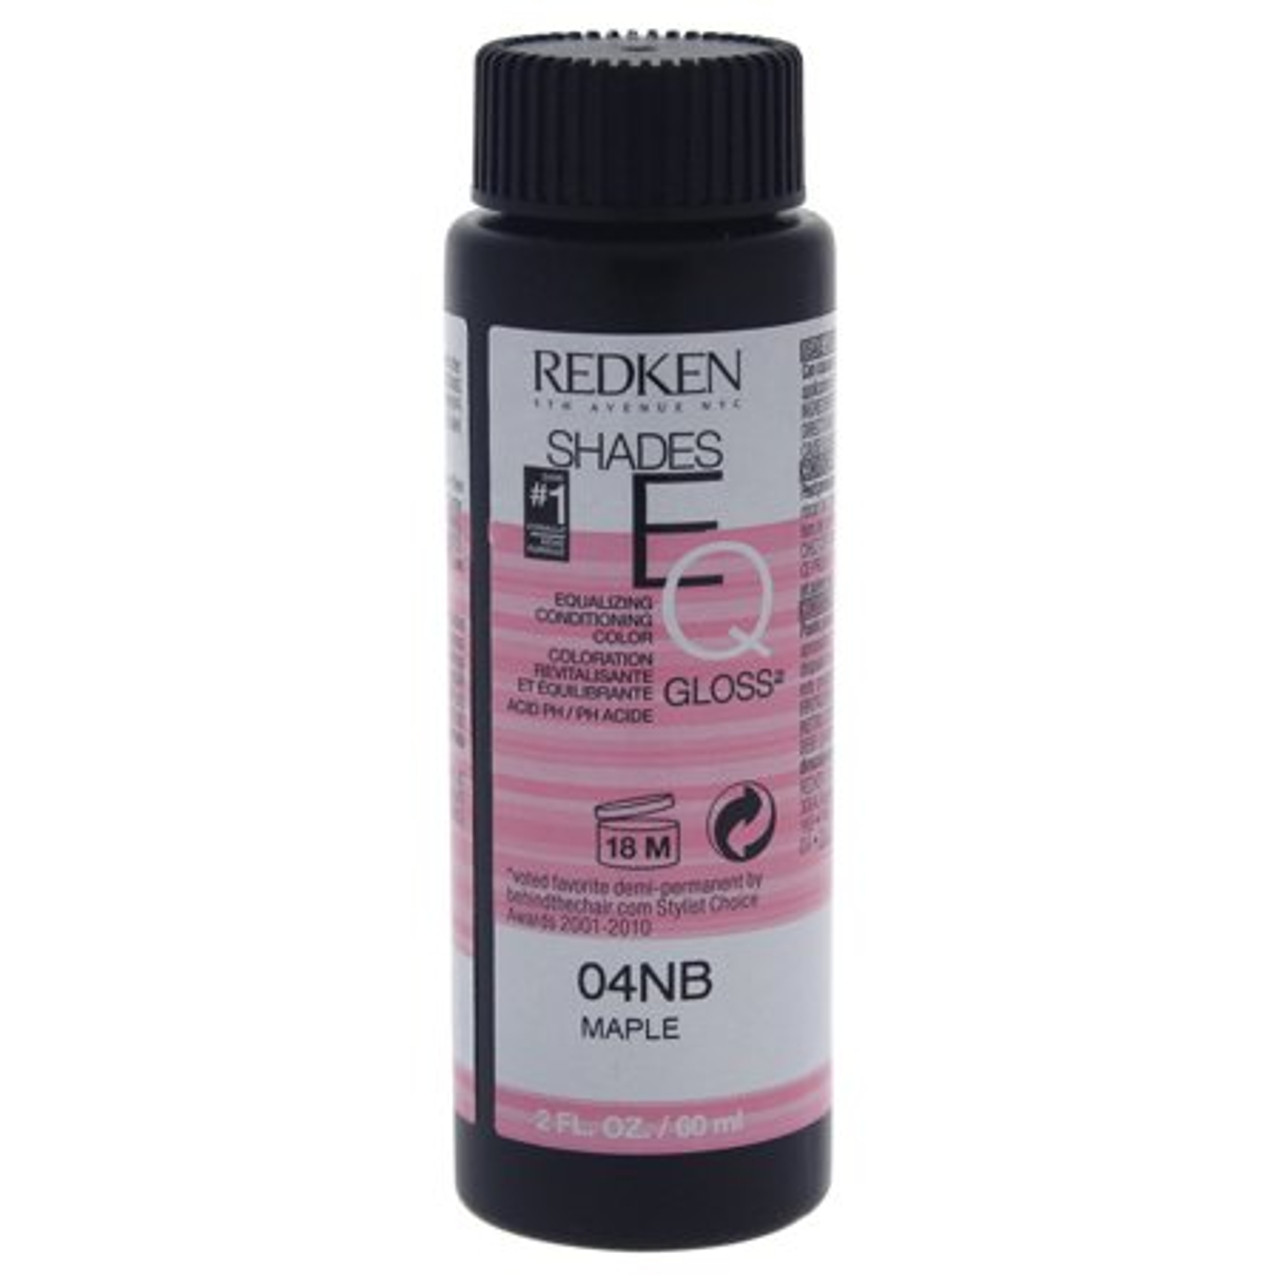 Redken Shades EQ Color 04NB Maple